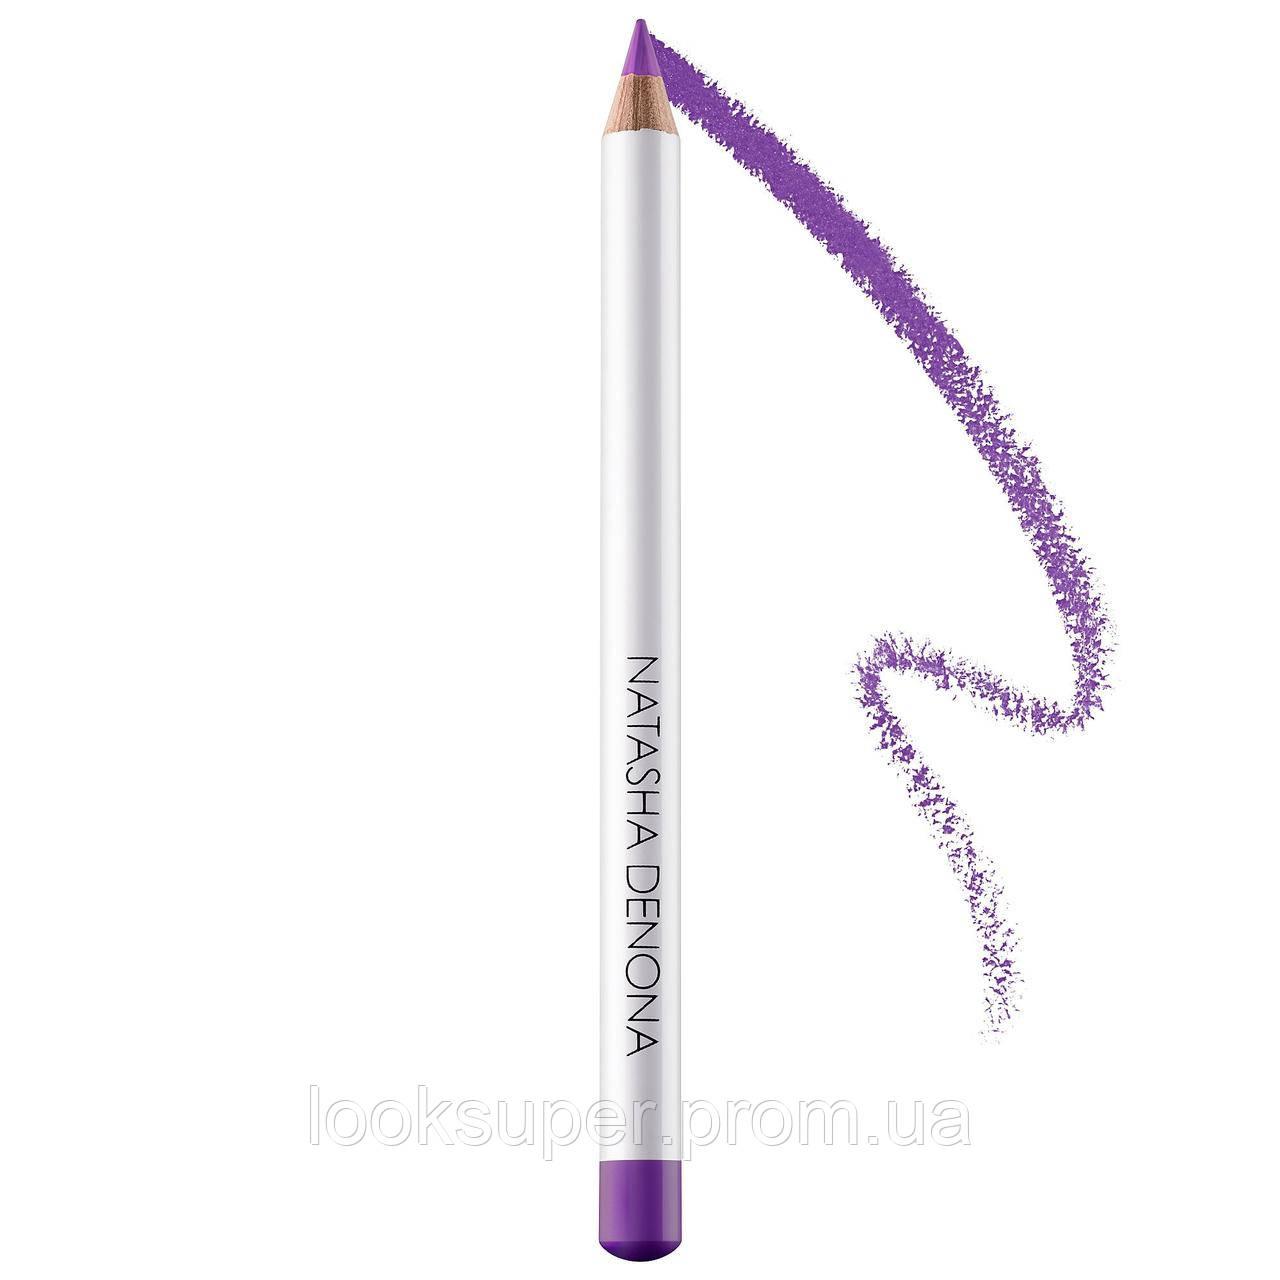 Карандаш для подводки глаз NATASHA DENONA  Eye Liner Pencil  violet